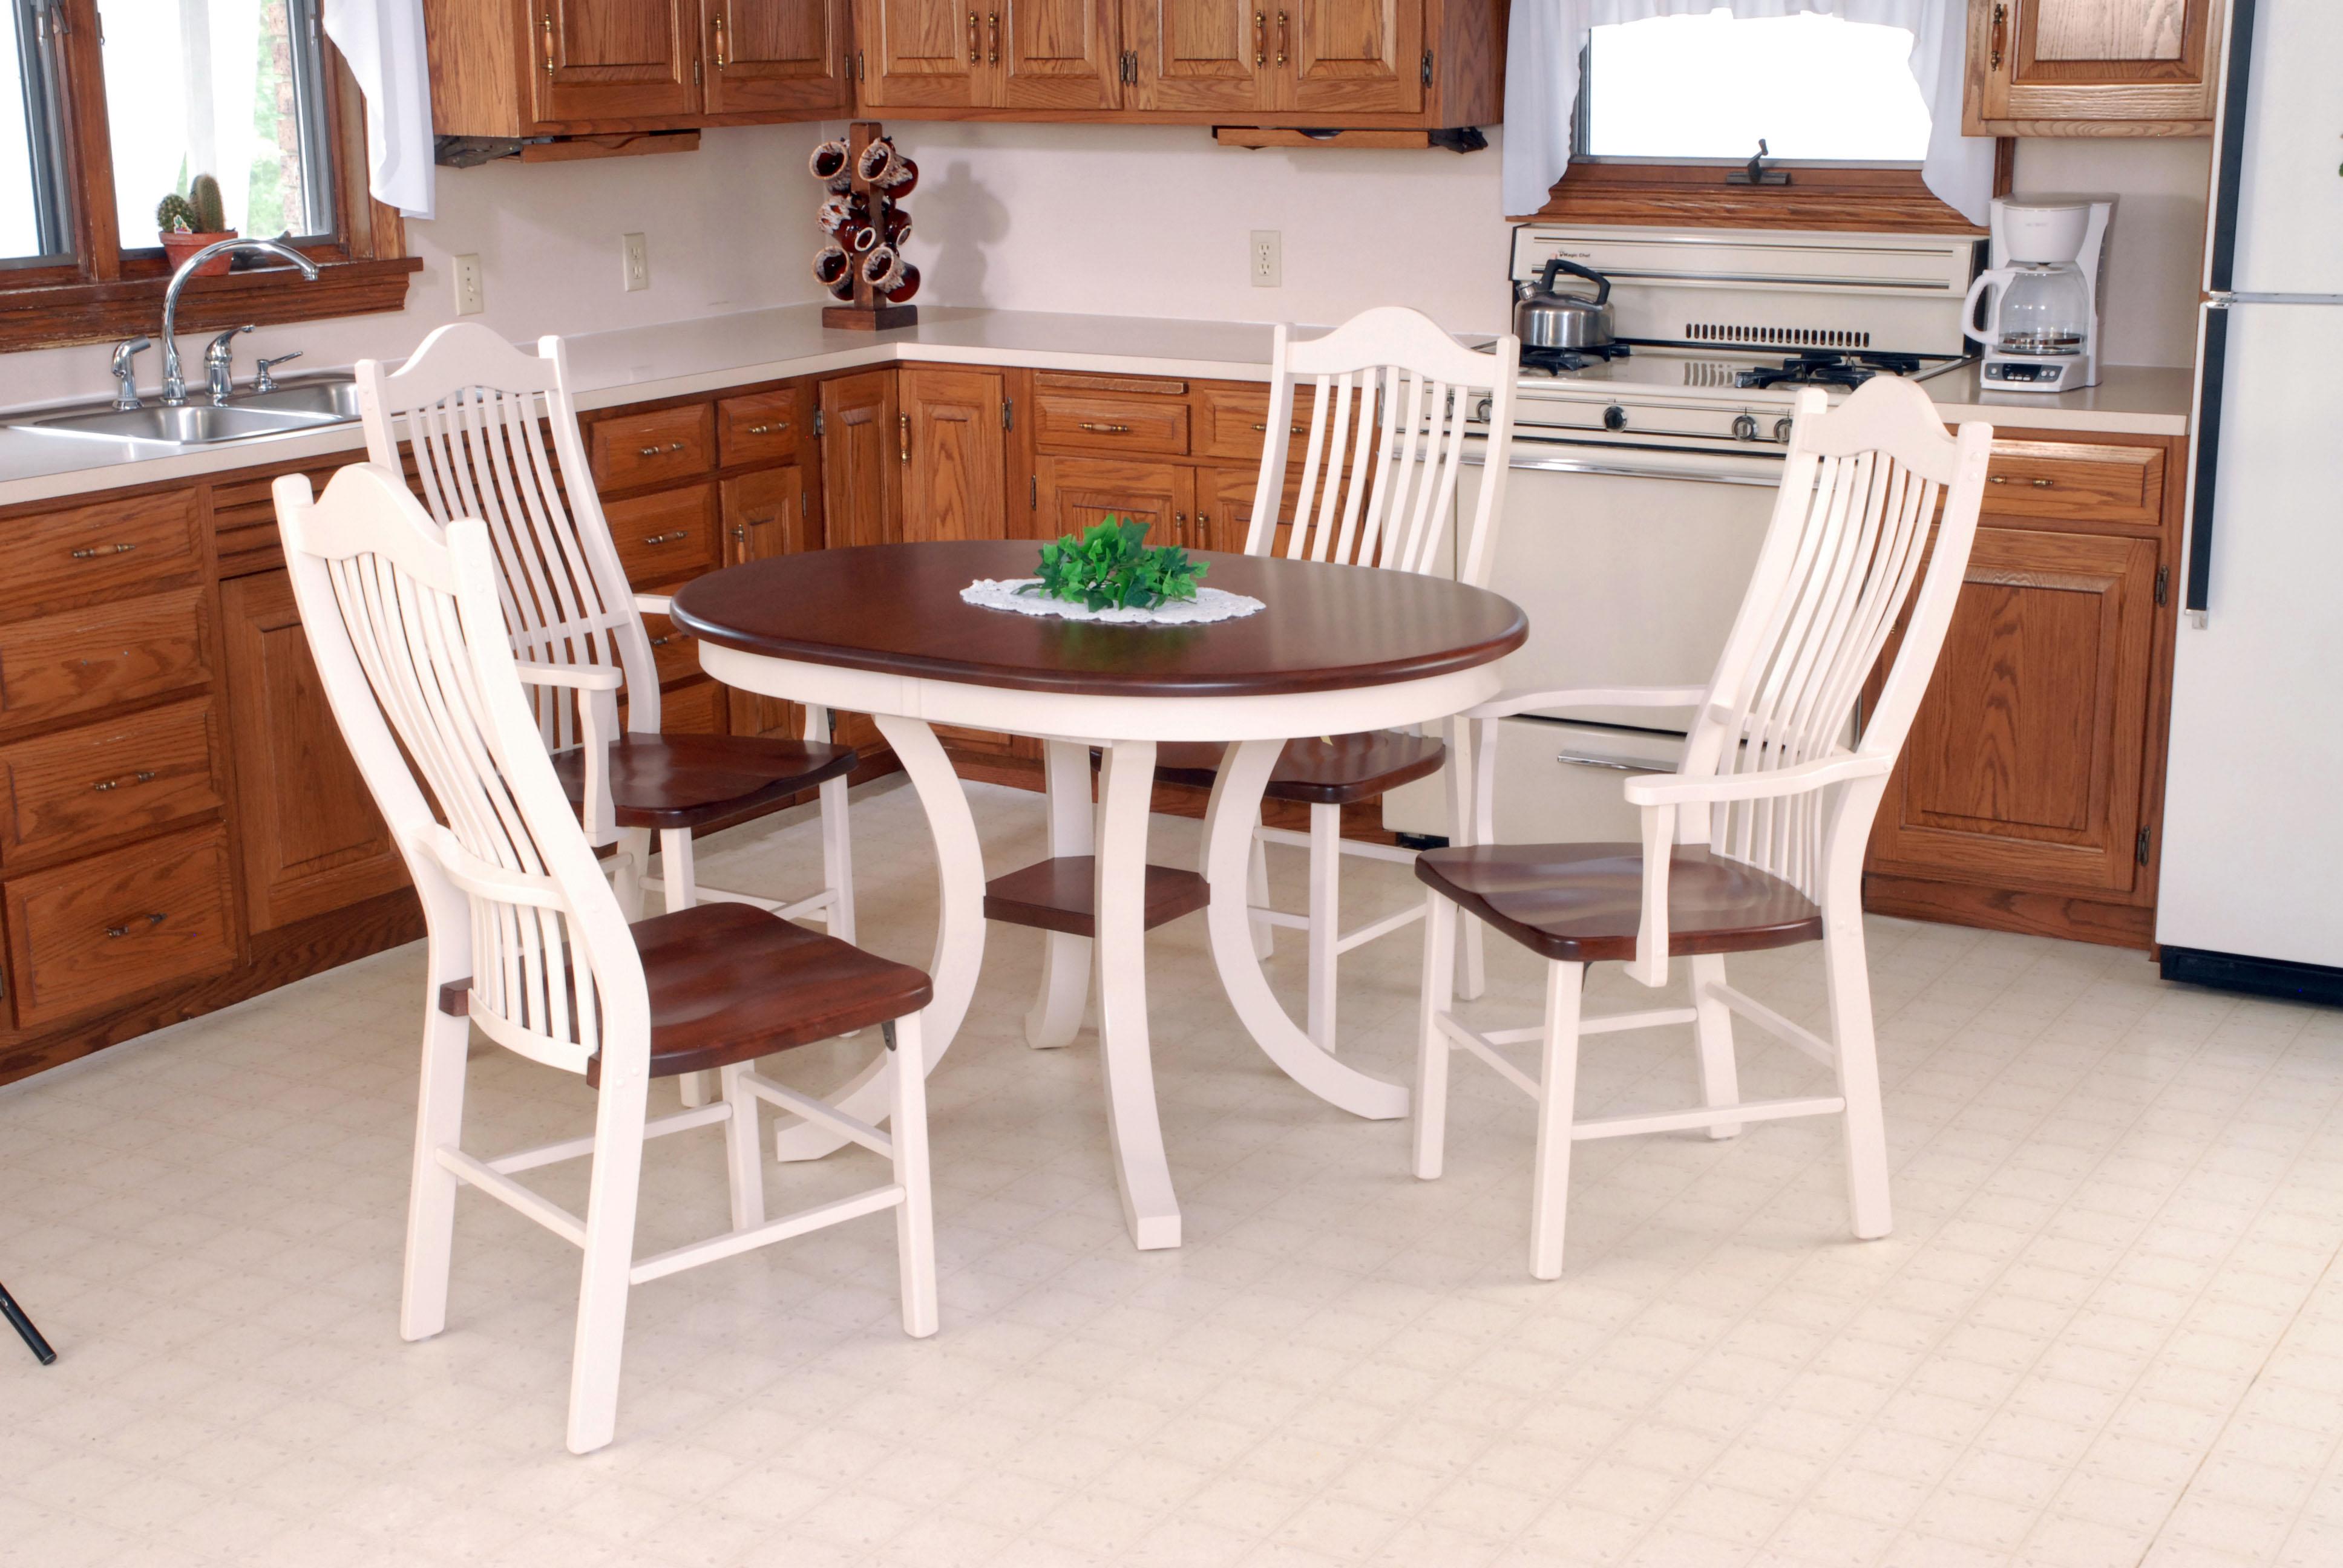 ... interesting unique wood kitchen tables in kitchen tables ... VYRIKZD